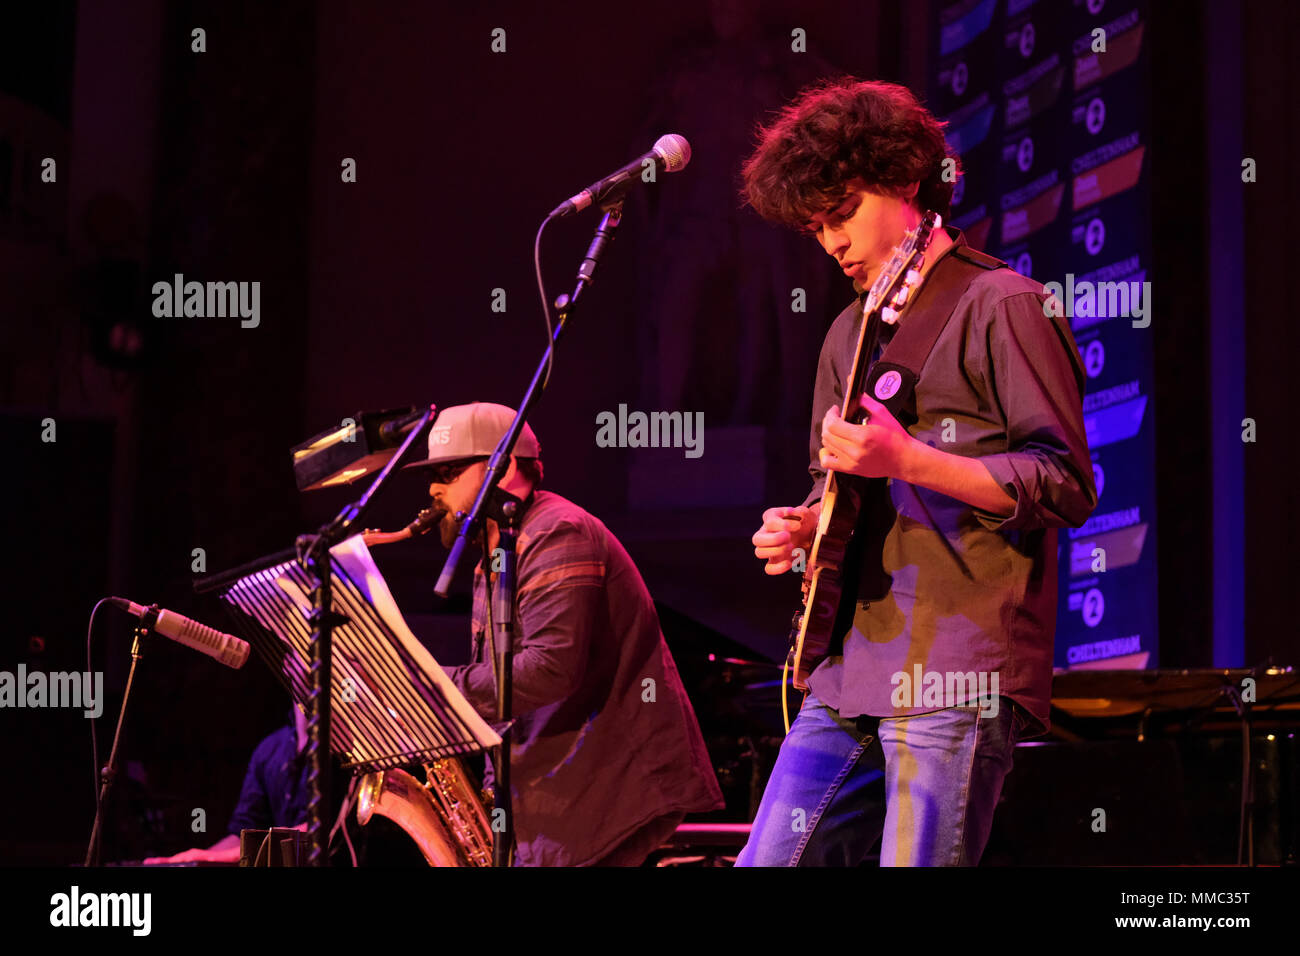 Winner of the 2017 LetterOne RISING STARS Jazz Award, Tom Ibarra performing at the Cheltenham Jazz Festival, Cheltenham ,UK. May 4, 2018 - Stock Image